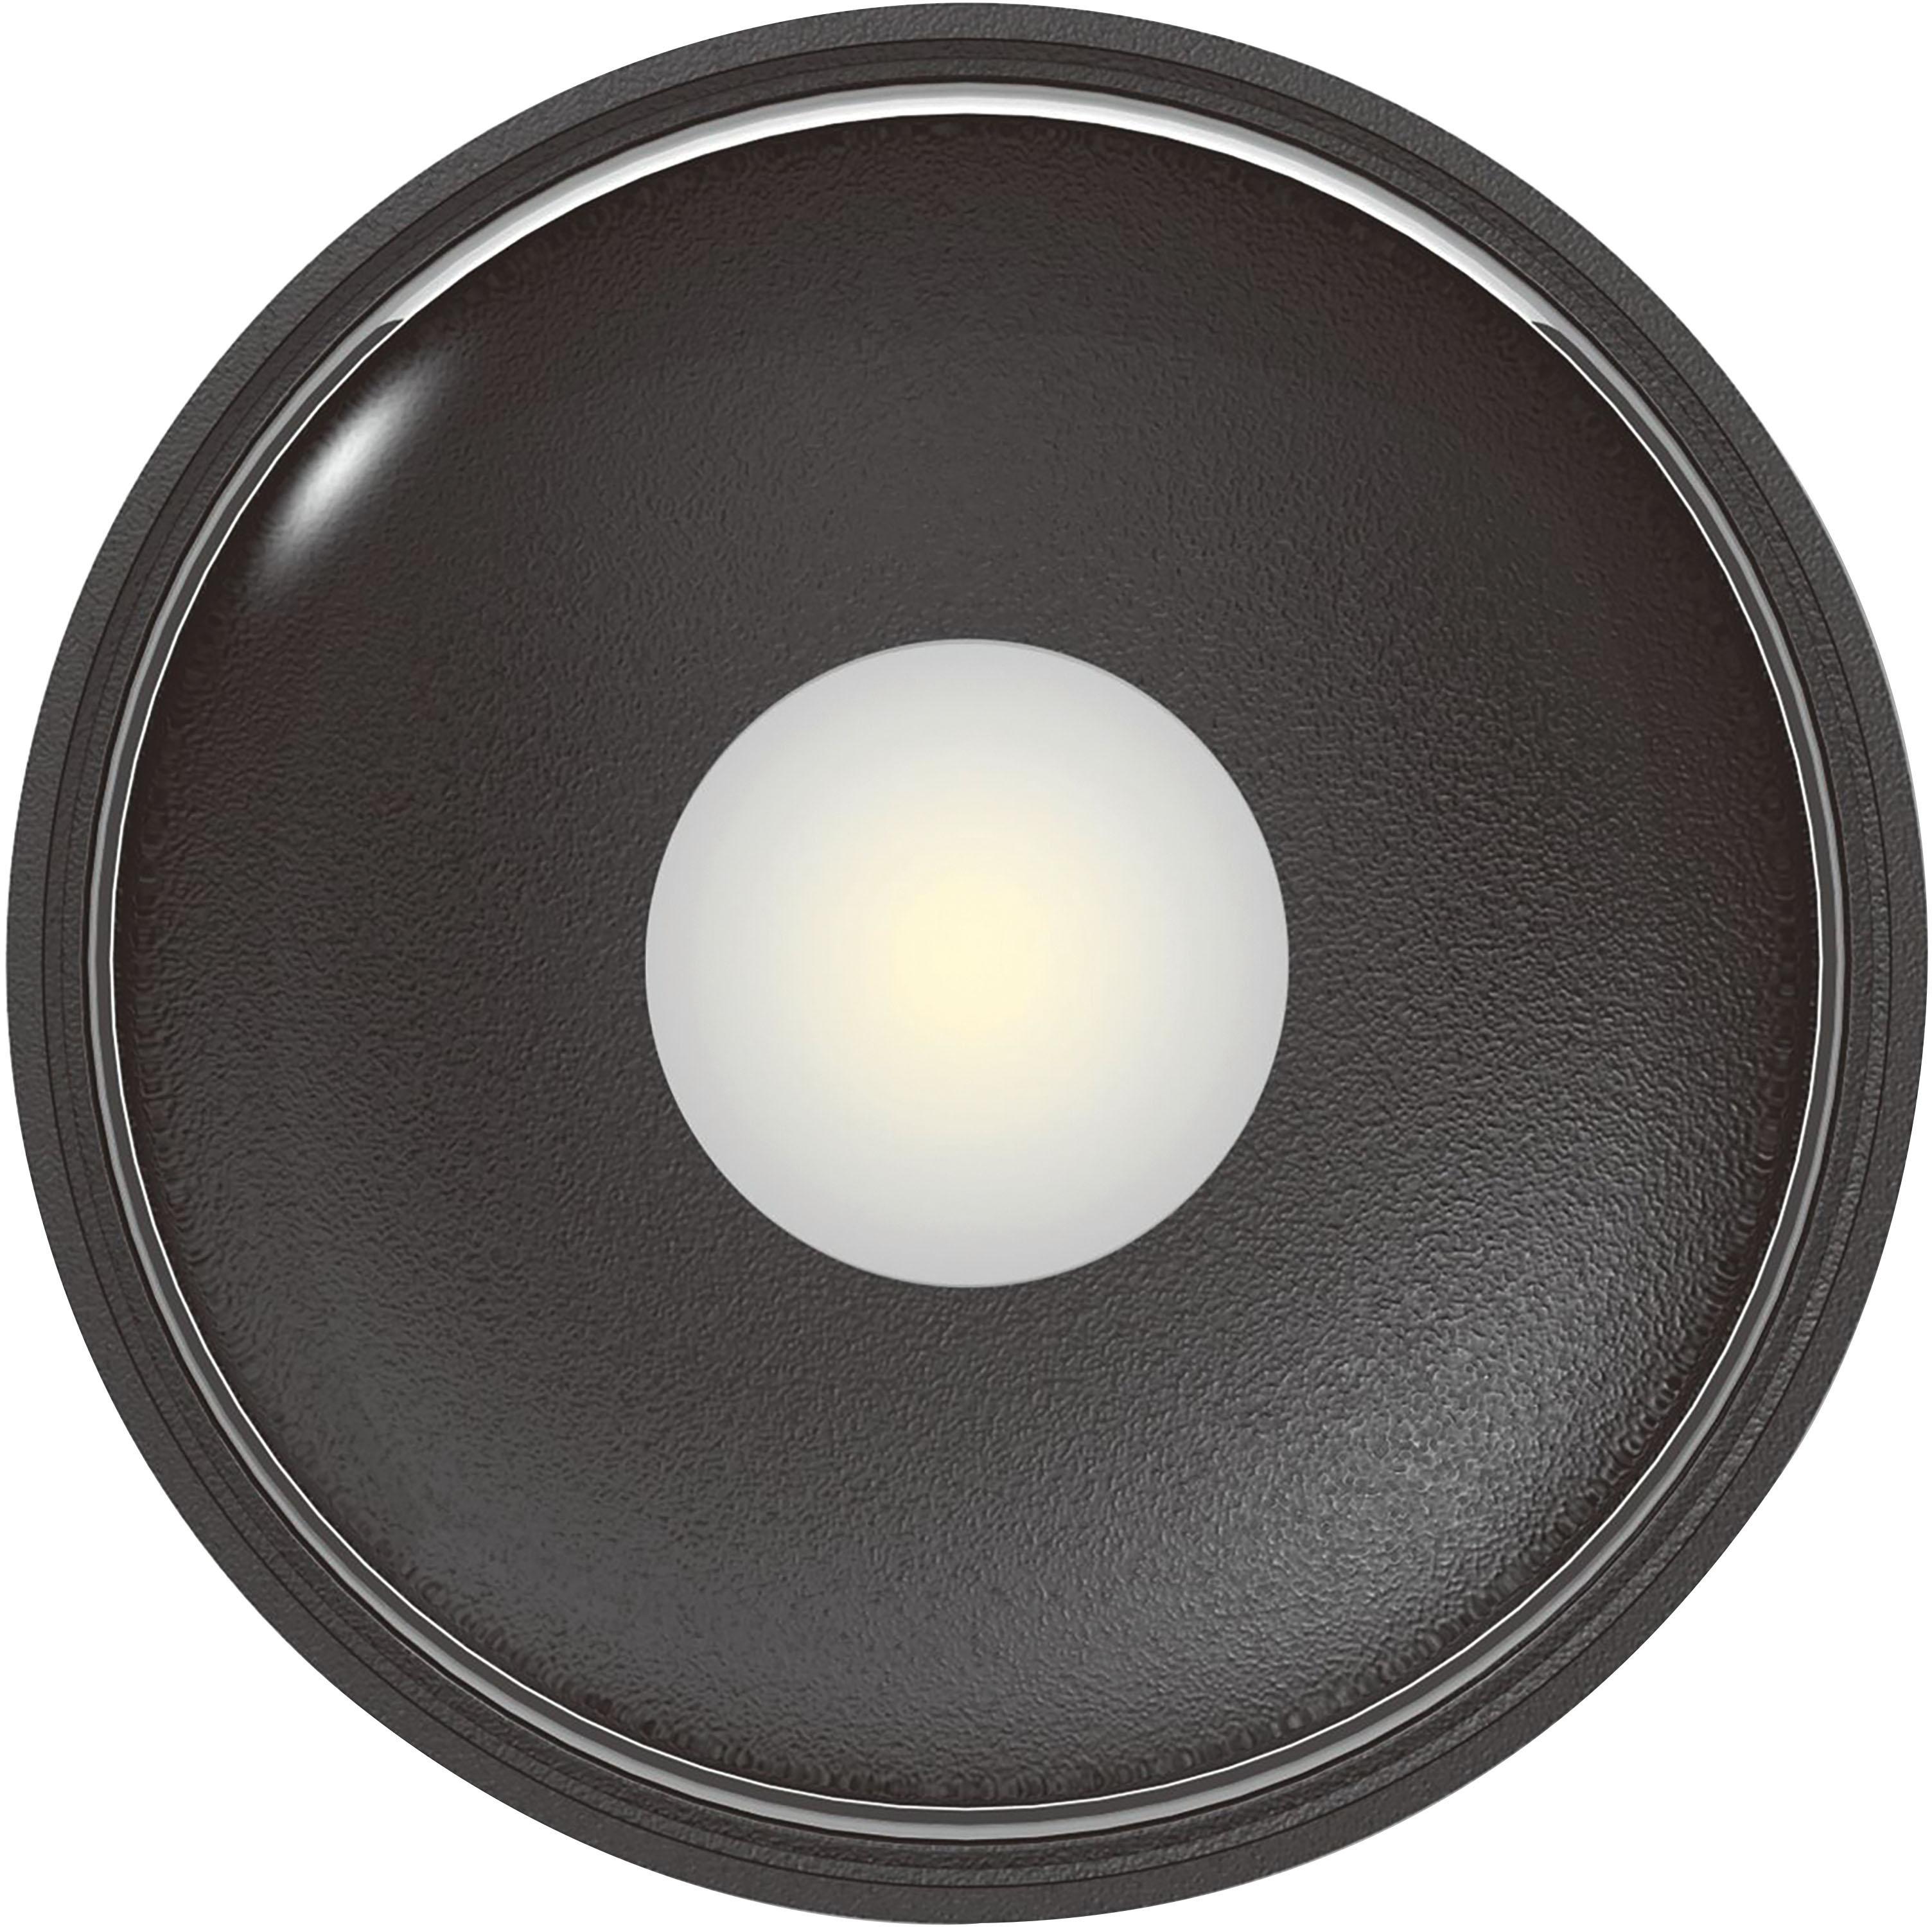 HEITRONIC LED Deckenleuchte Girona, LED-Board, Warmweiß, Höhe nur 36 mm